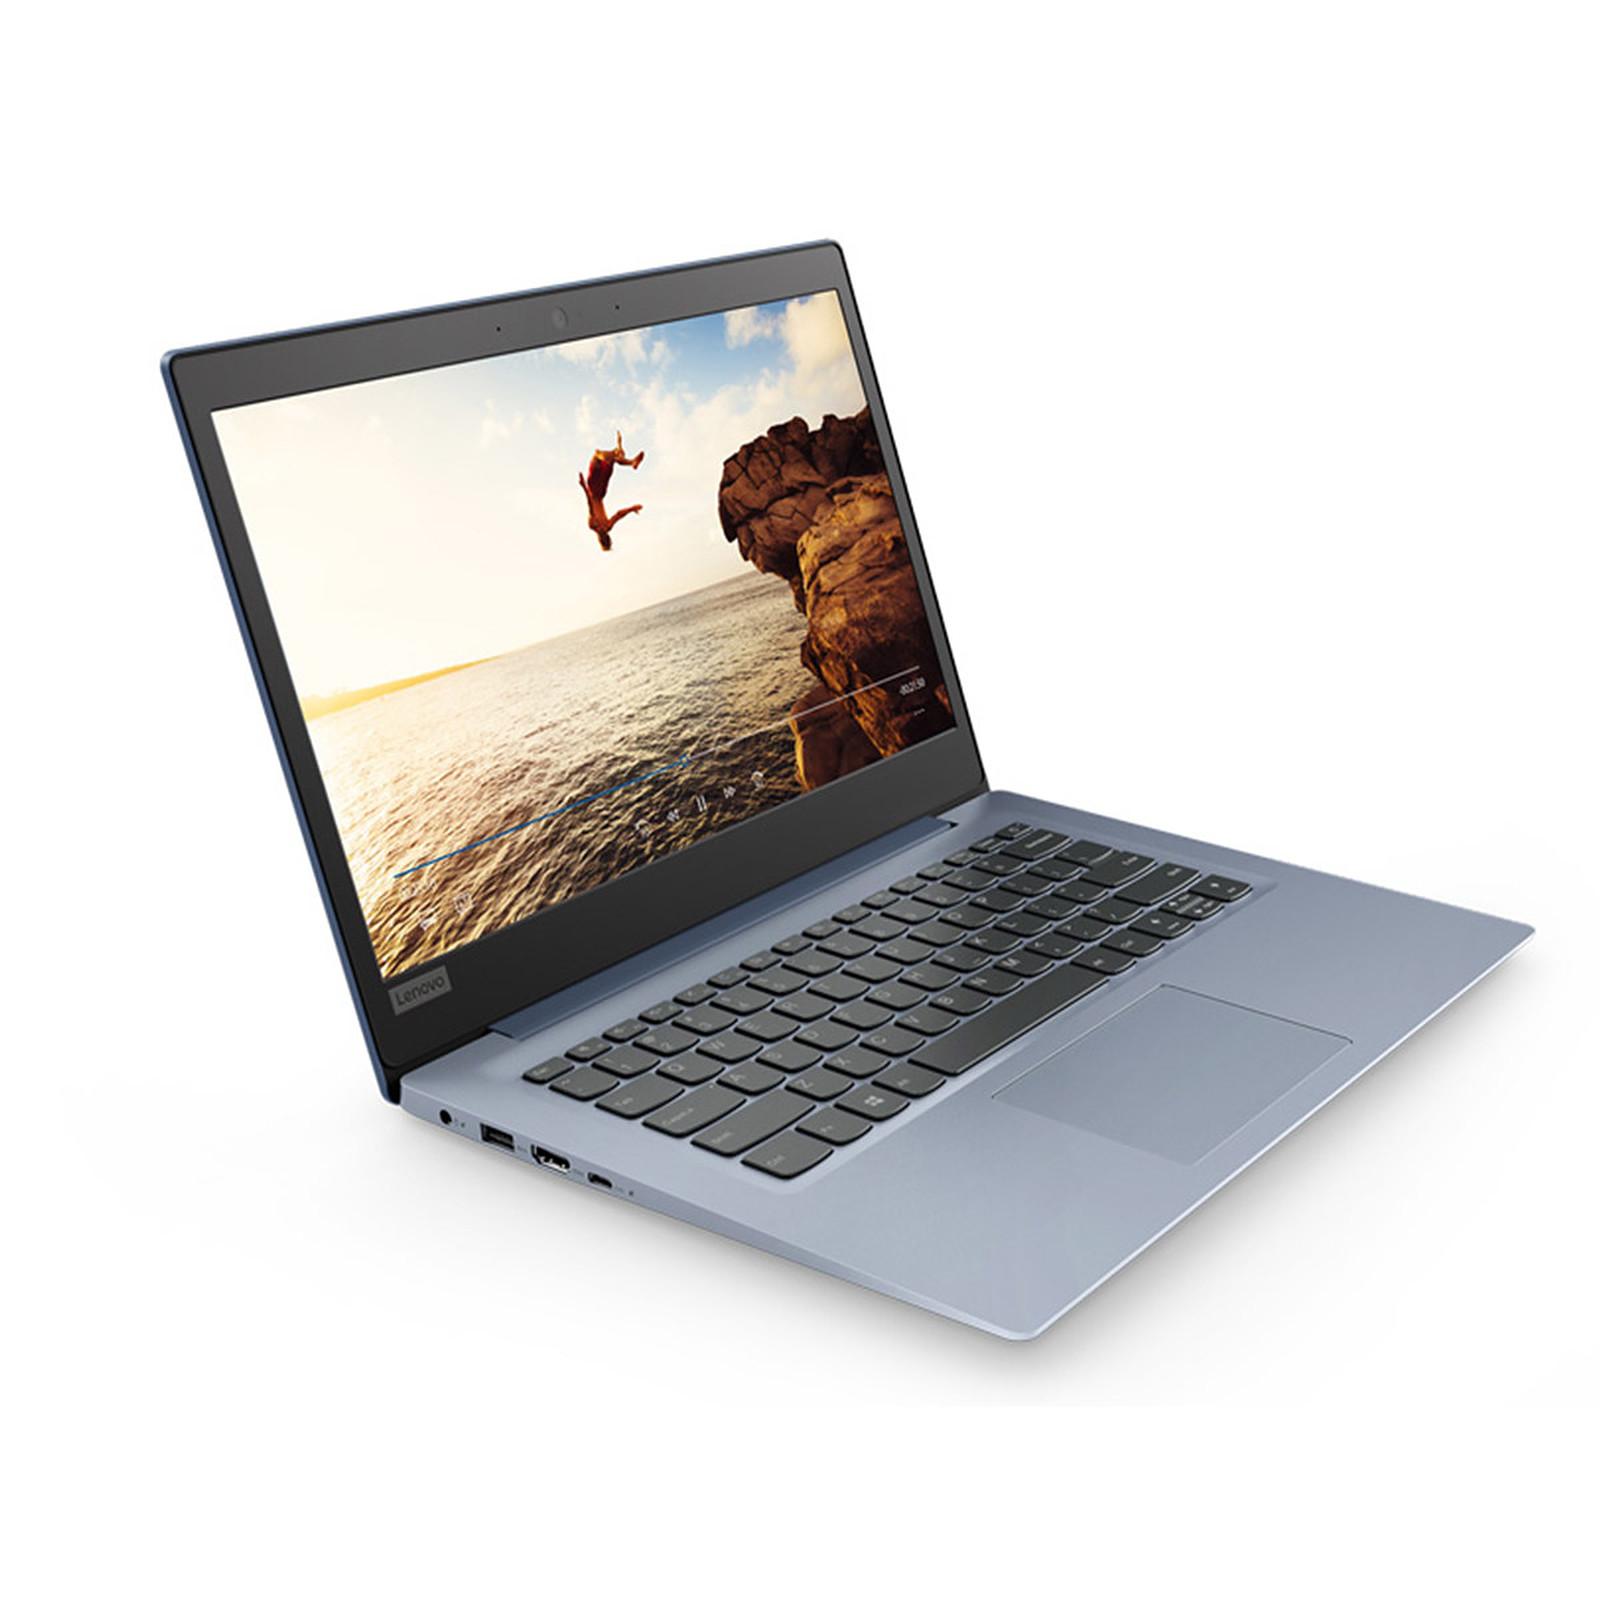 "LENOVO 120S-14IAP N3350, 4GB, 64GB, 14"", W10"